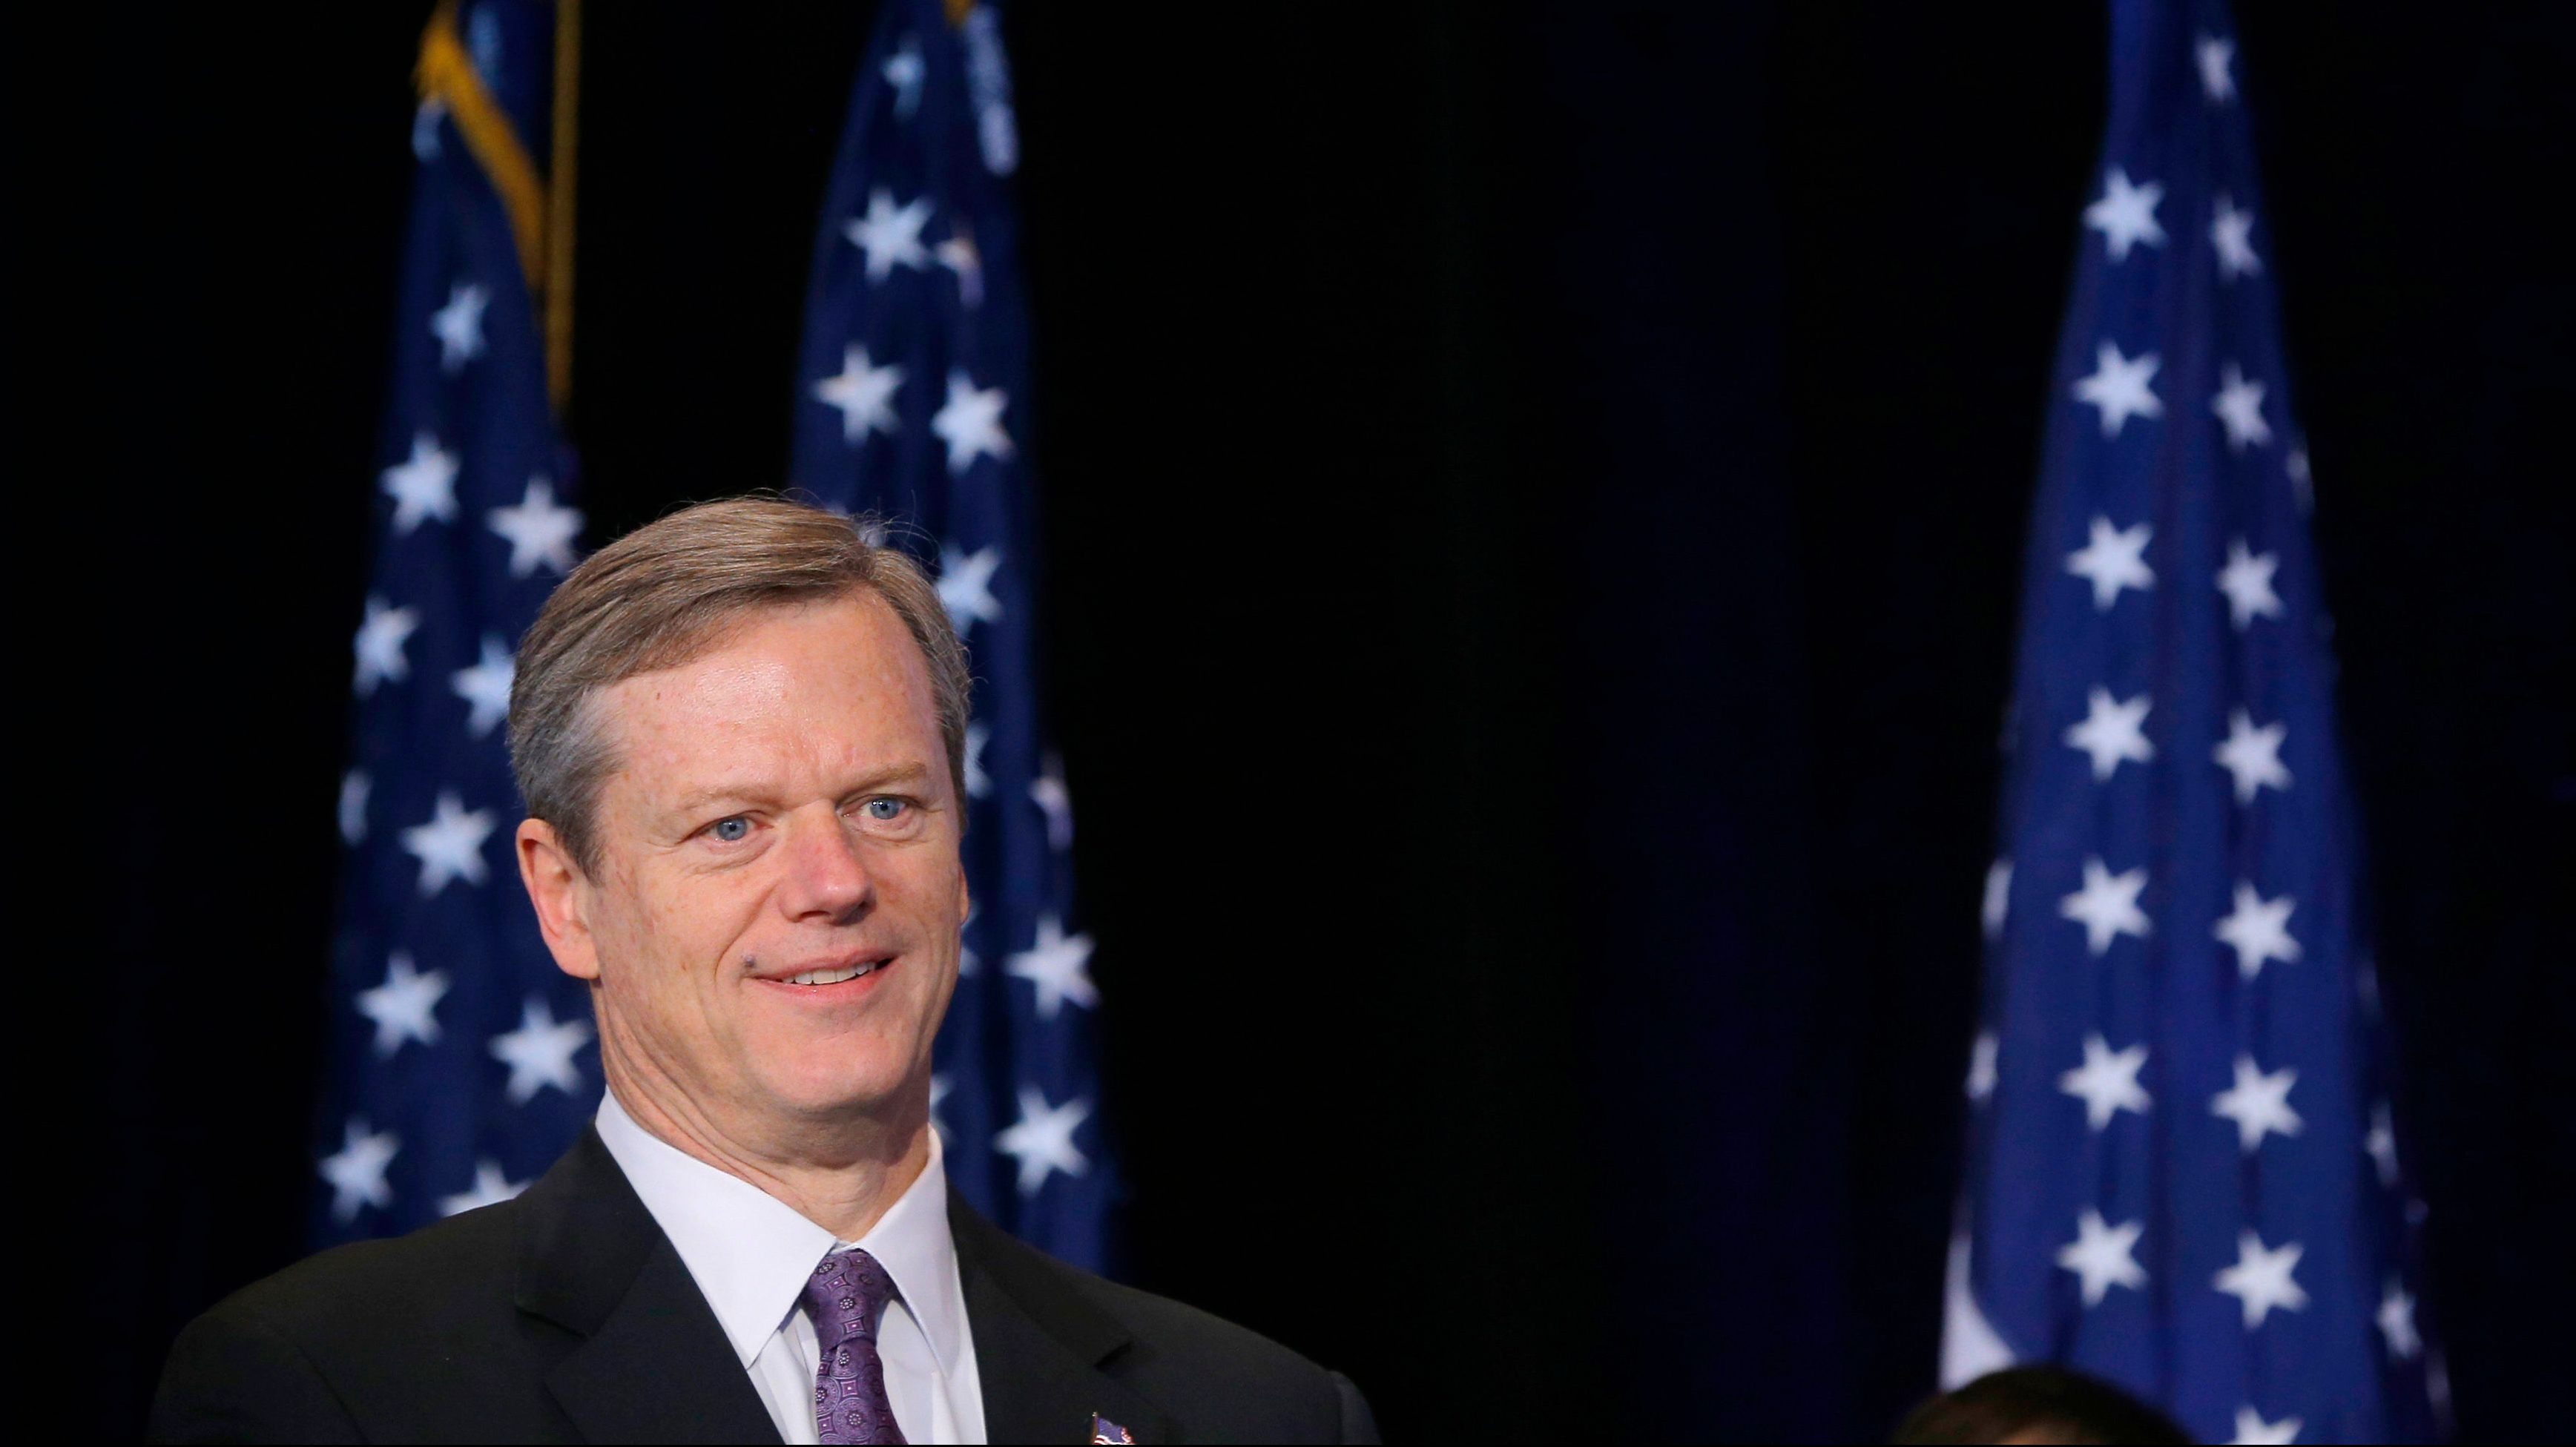 Massachusetts Governor Charlie Baker waits to speak at a news conference in Boston, Massachusetts, on January 9, 2015.